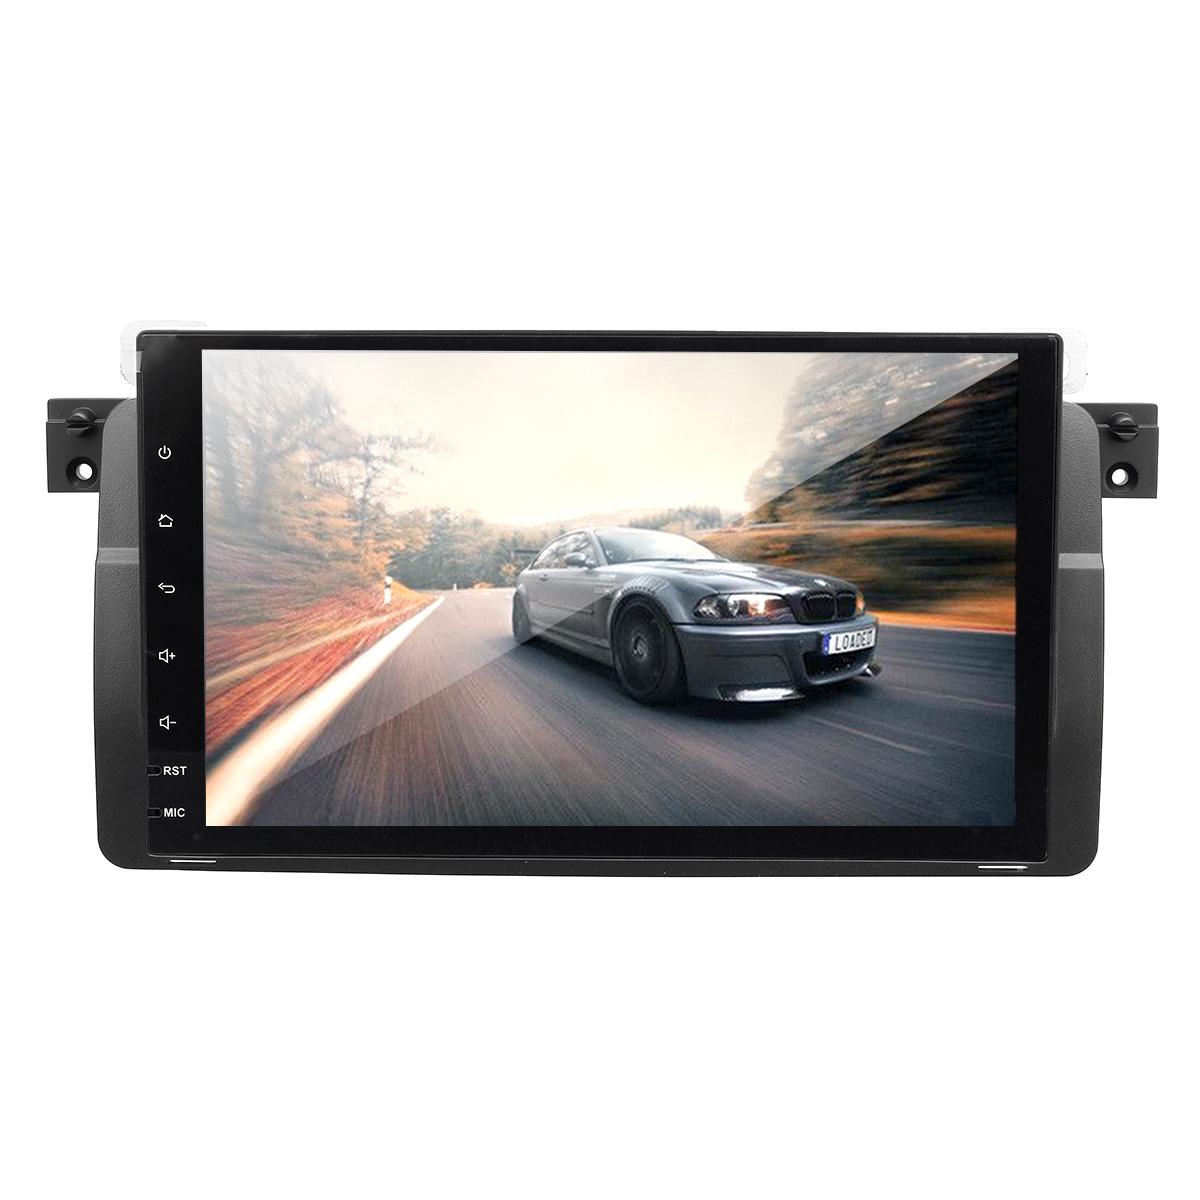 9 дюймов Android 8,0 Авто Стерео GPS Сб Навигация OBD DAB WiFi для BMW E46 M3 Rover 75 MG ZT